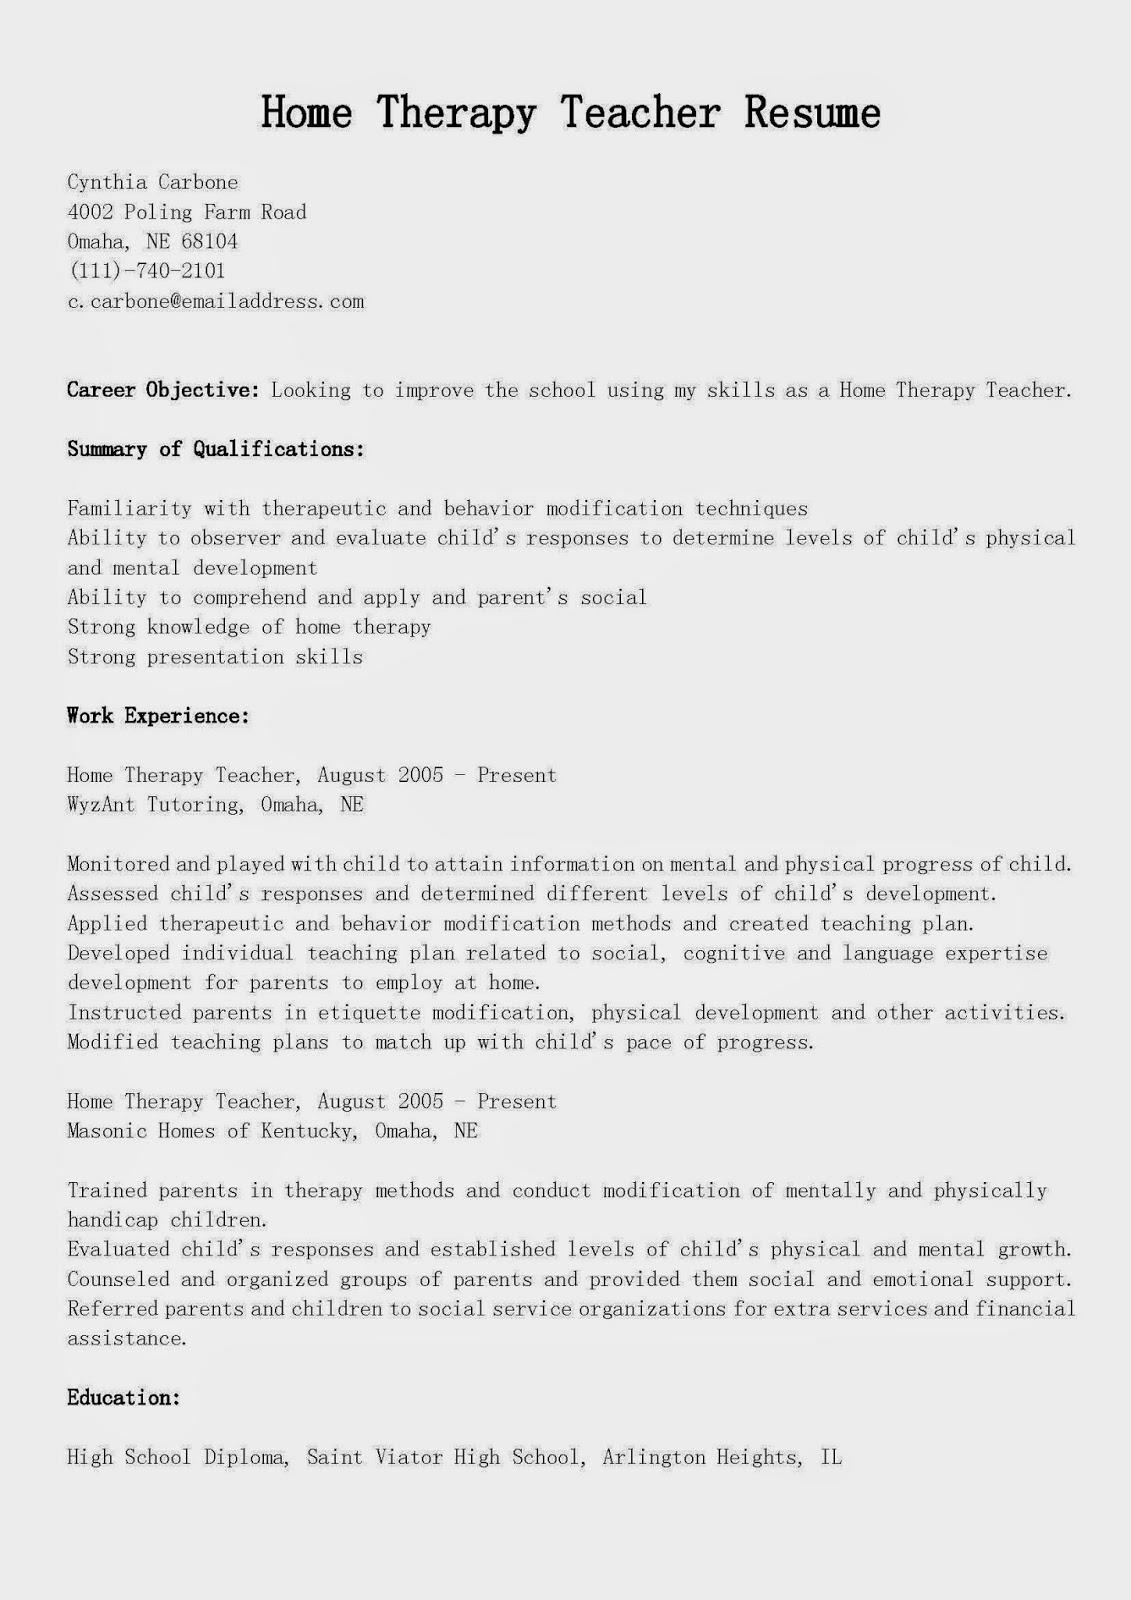 resume samples  home therapy teacher resume sample